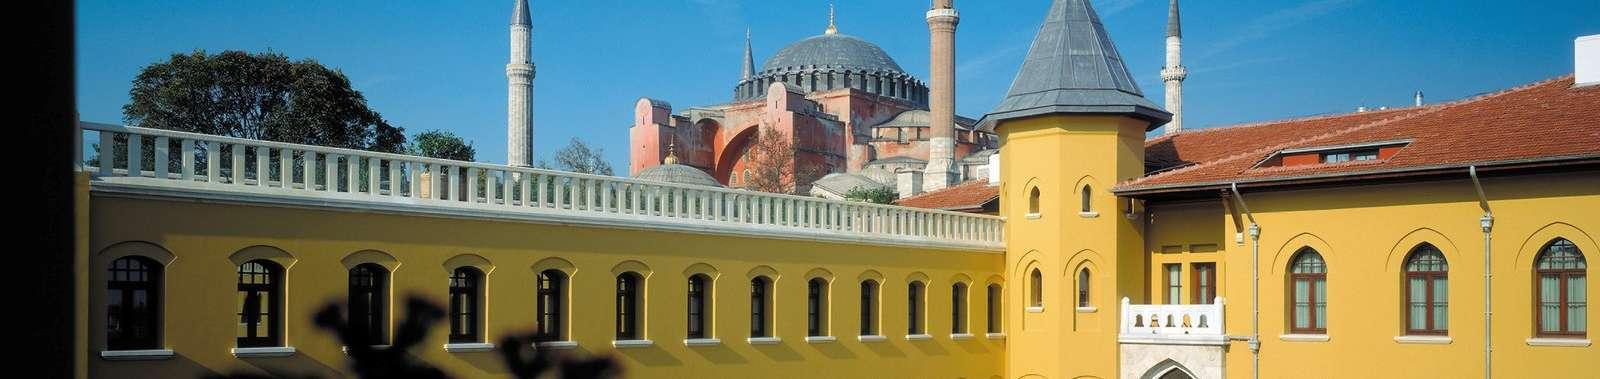 Istanbul_Four_Seasons_Hotels_Istanbul_at_Sultanahmet__Turm_lowres_COPYRIGHT_Four_Seasons_Jaime_Ardiles-Arce